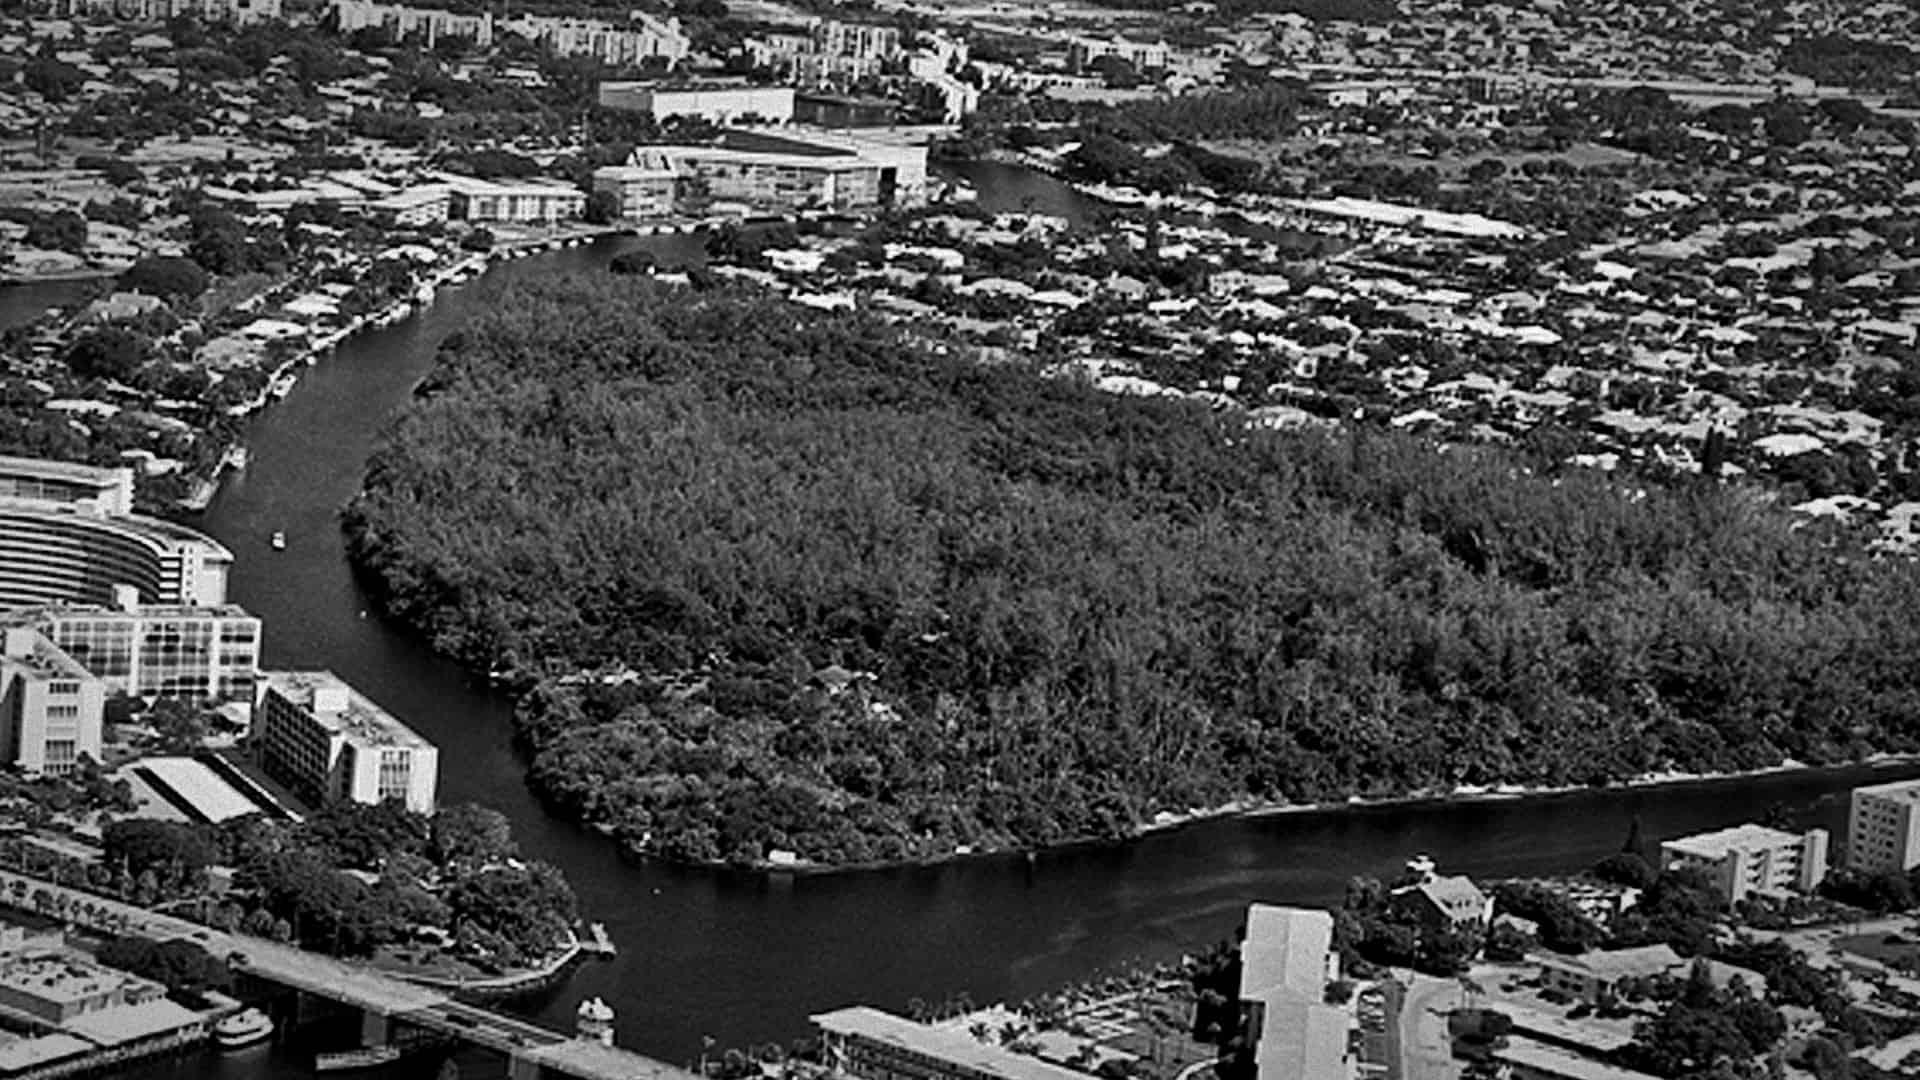 Capone Island in Deerfield Beach, FL